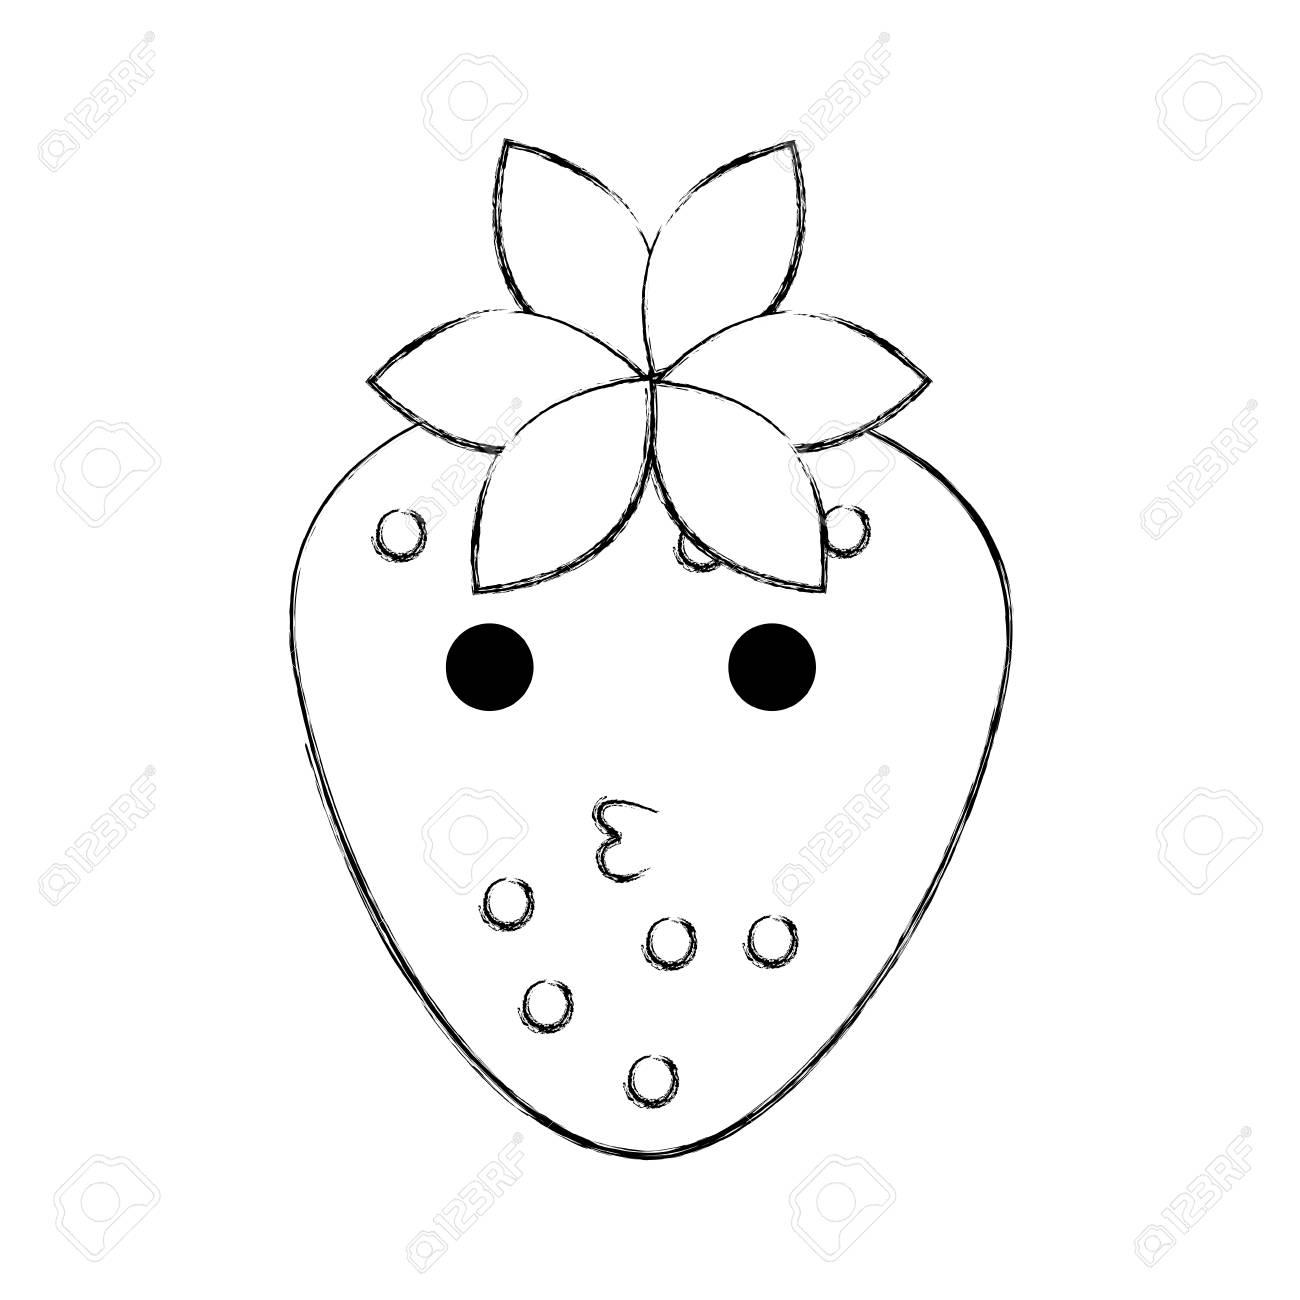 Kawaii Strawberry Fruit Cheerful Cartoon Vector Illustration